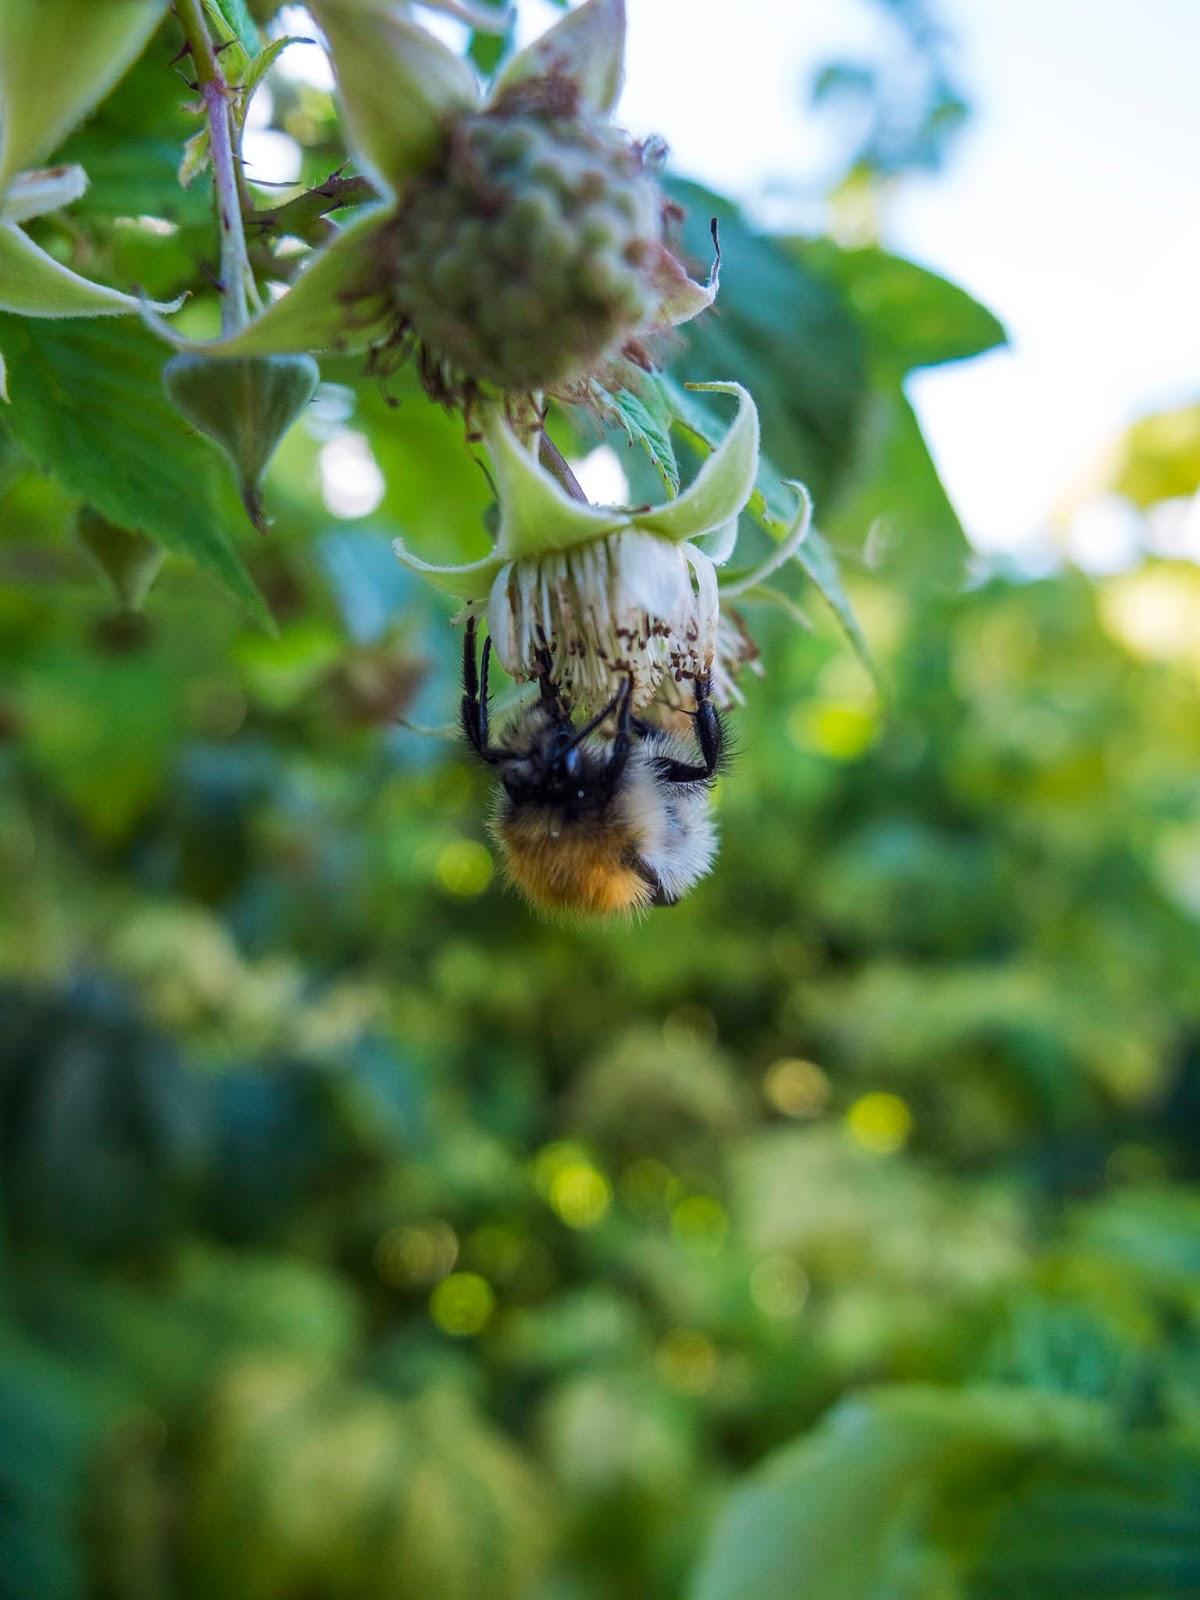 A honey bee pollinating a raspberry flower.